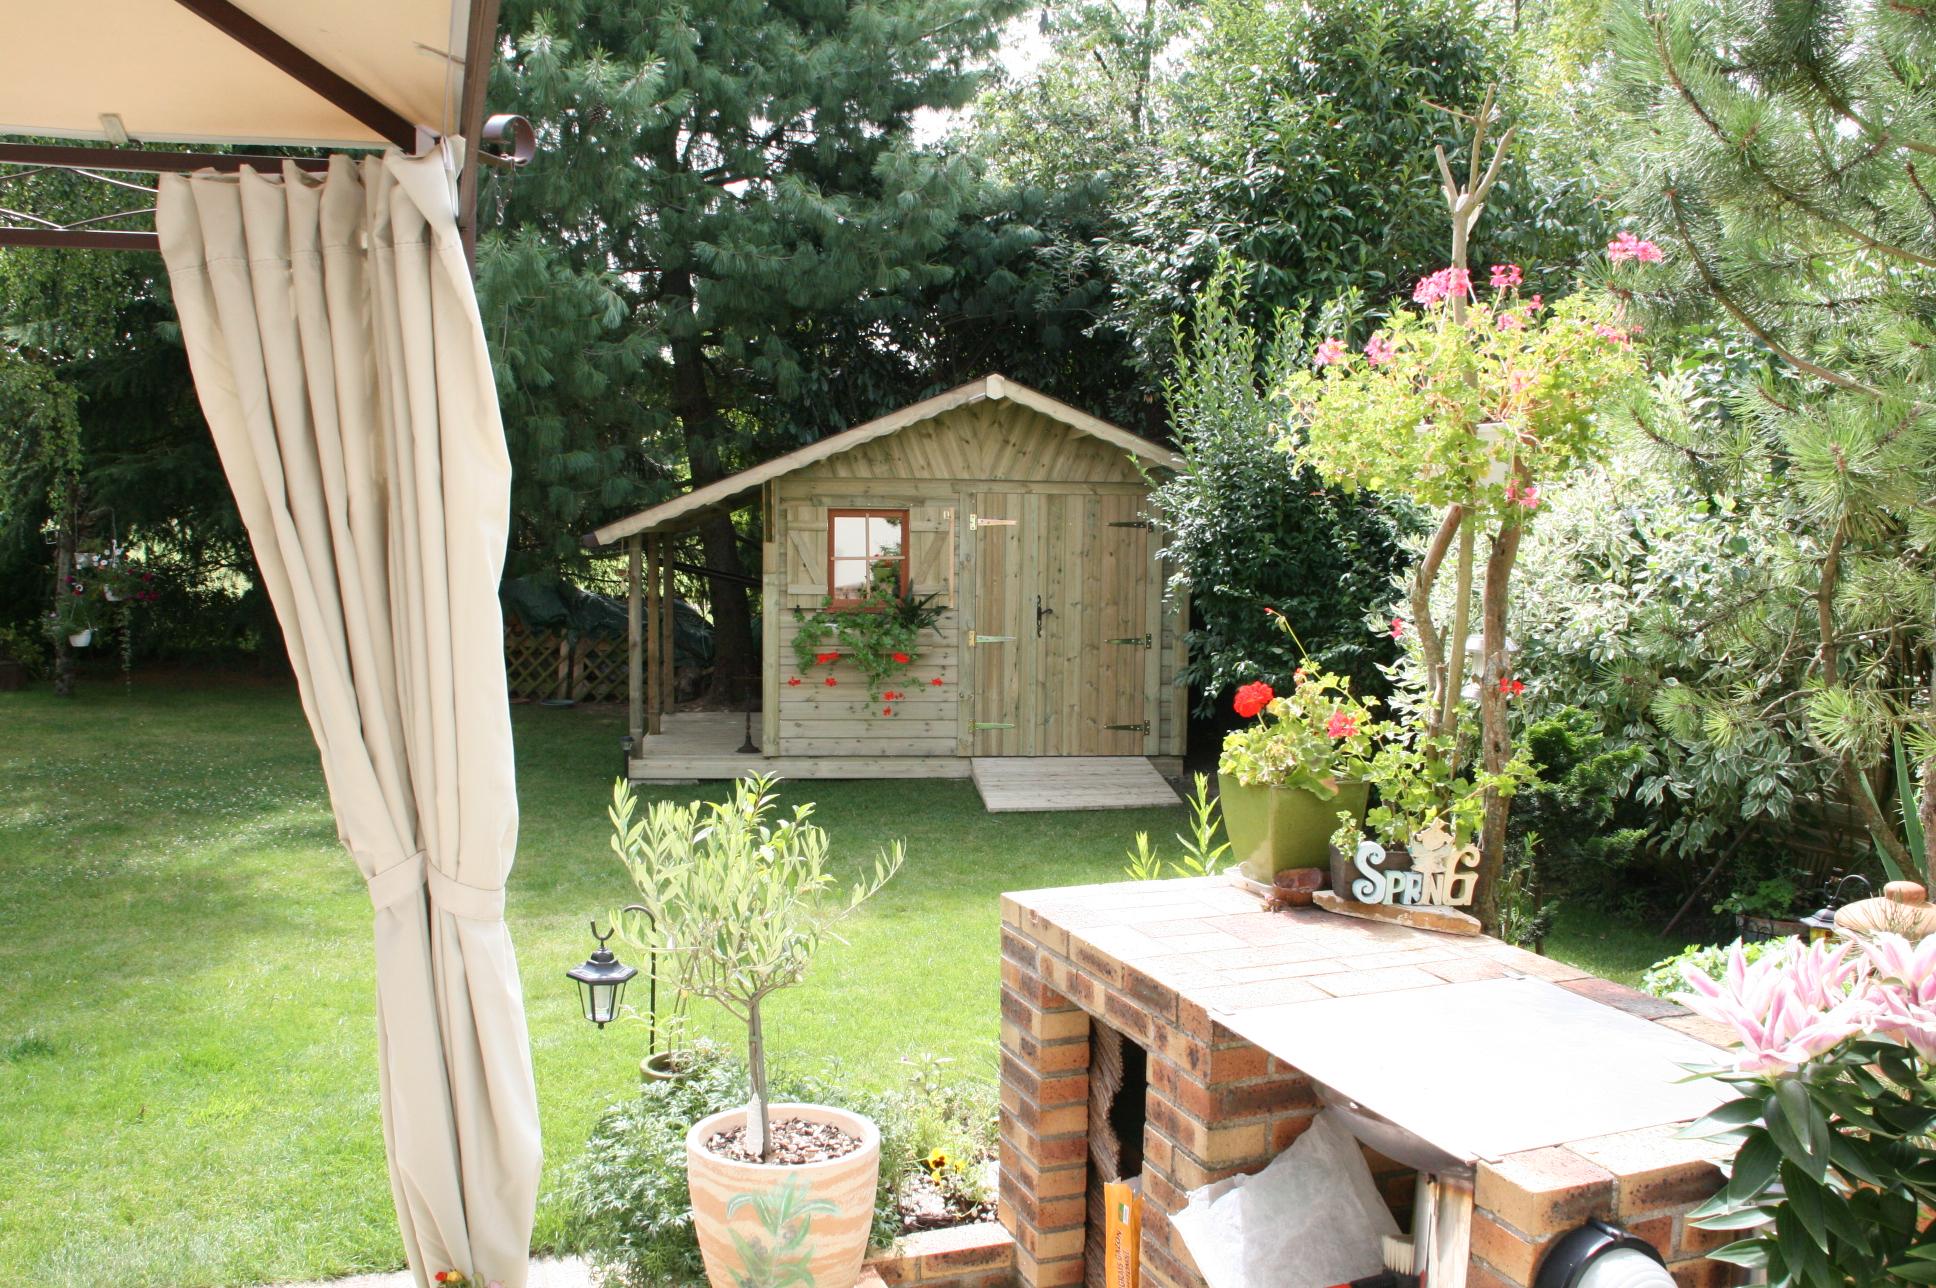 Garten moy car port terrasse bardage facade et abri de - Abri de jardin pergola ...